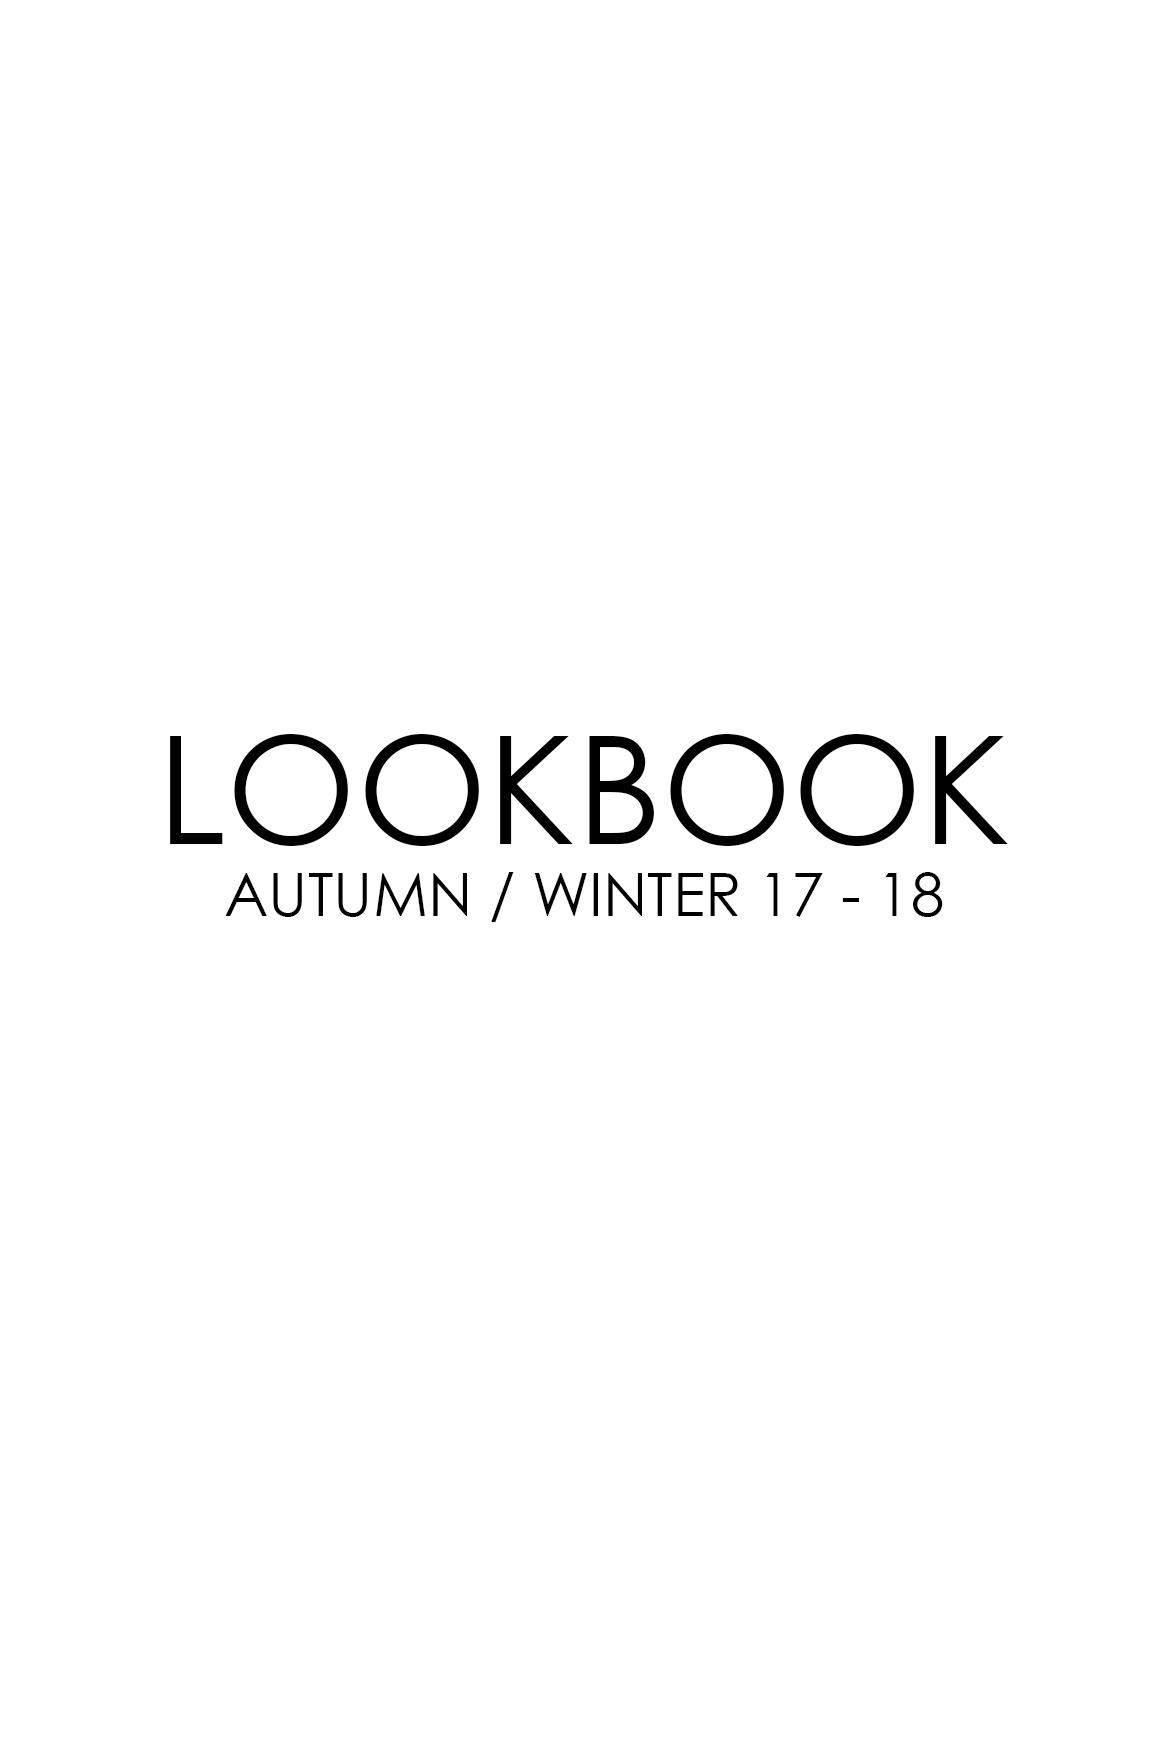 Lookbook Loxwood Automne Hiver 2017 2018